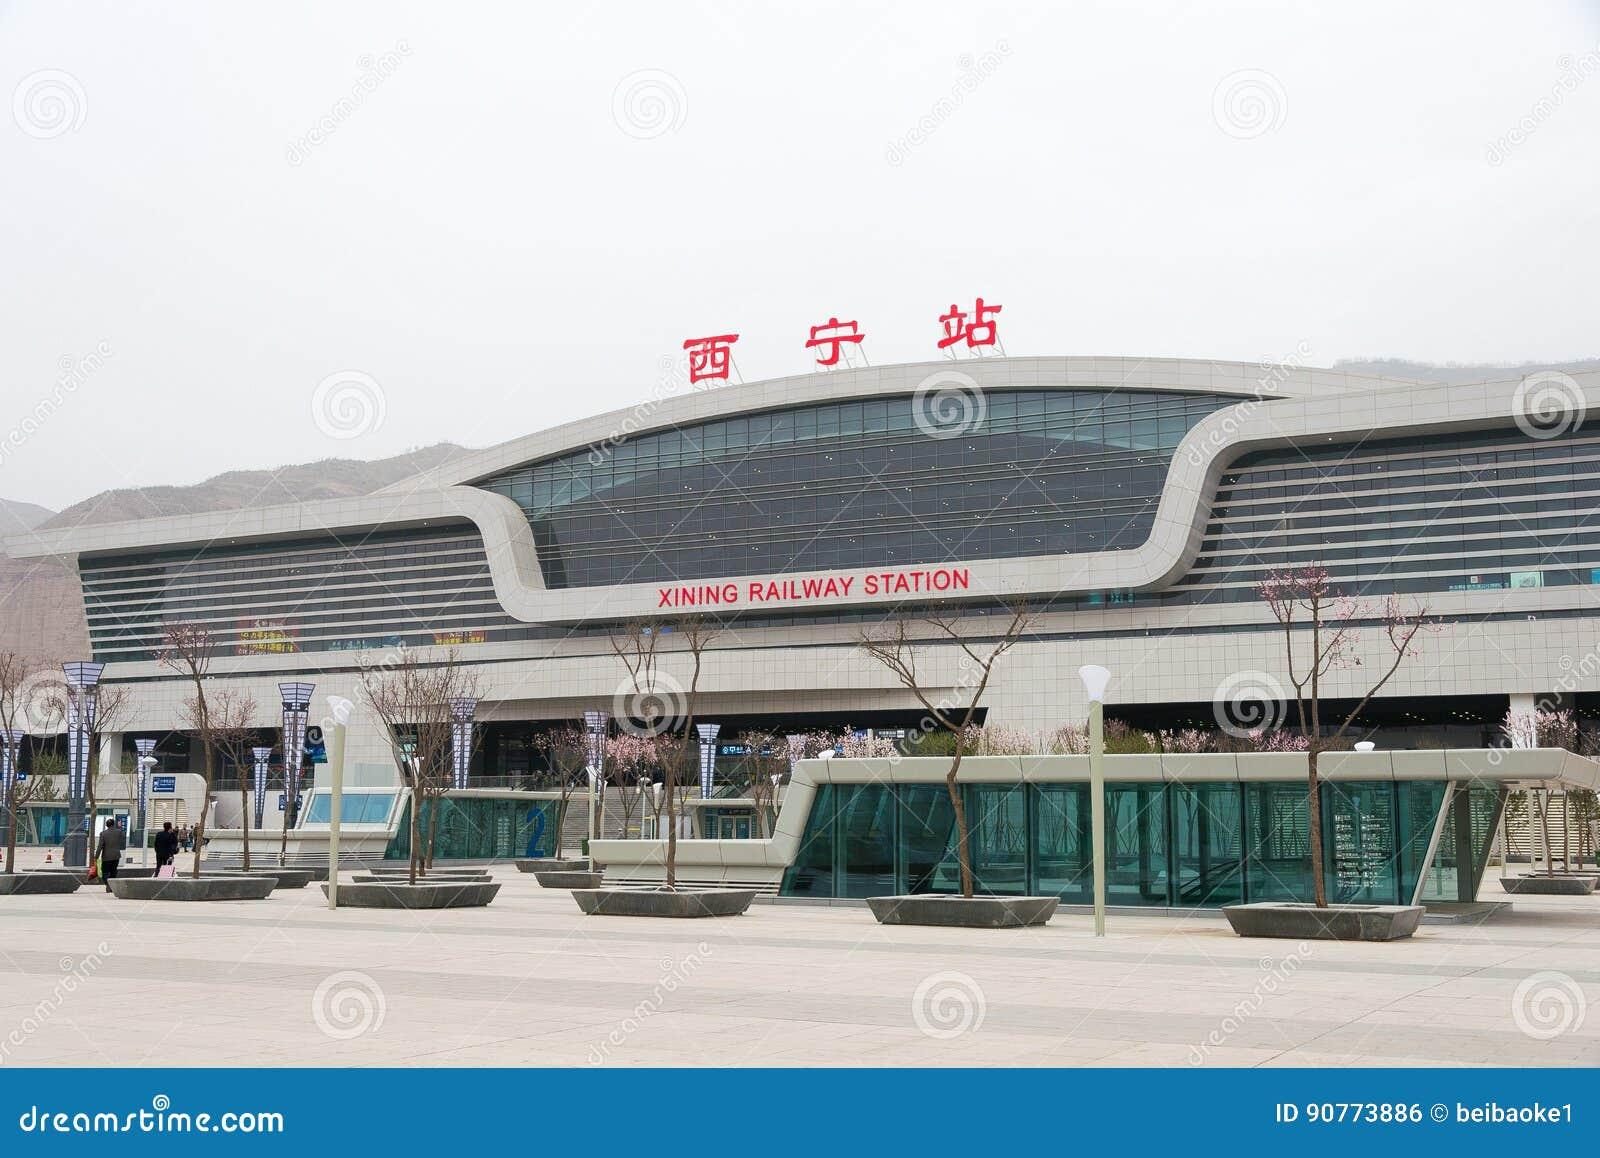 QINGHAI, CHINA - April 04 2015: Xining Railway Station in Xining, Qinghai, China.